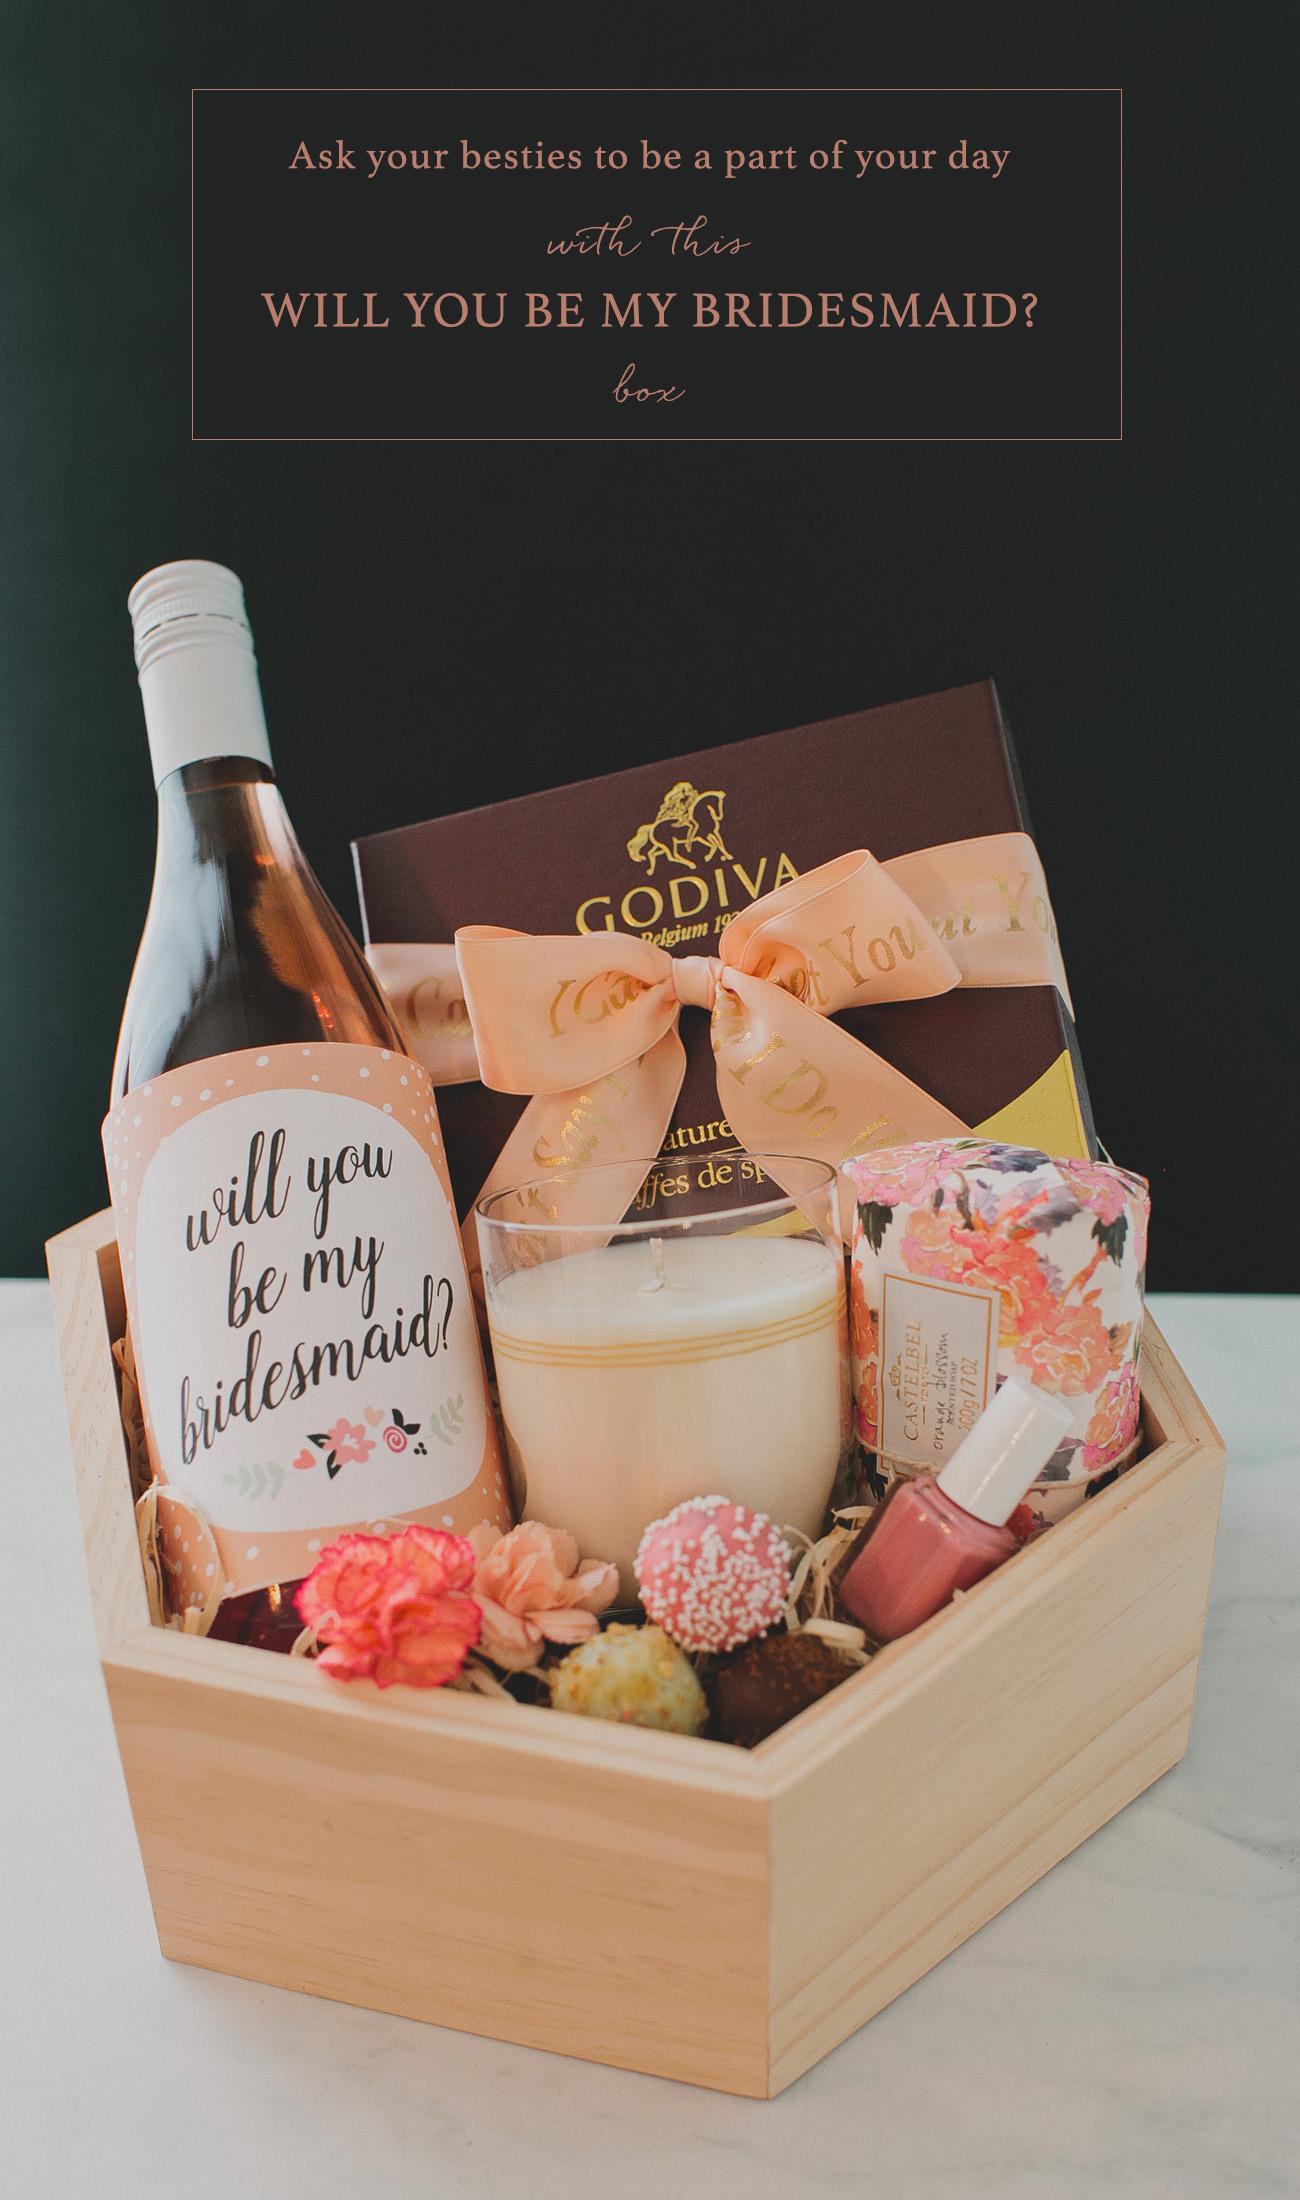 DIY Bridesmaid Gift Box with Godiva